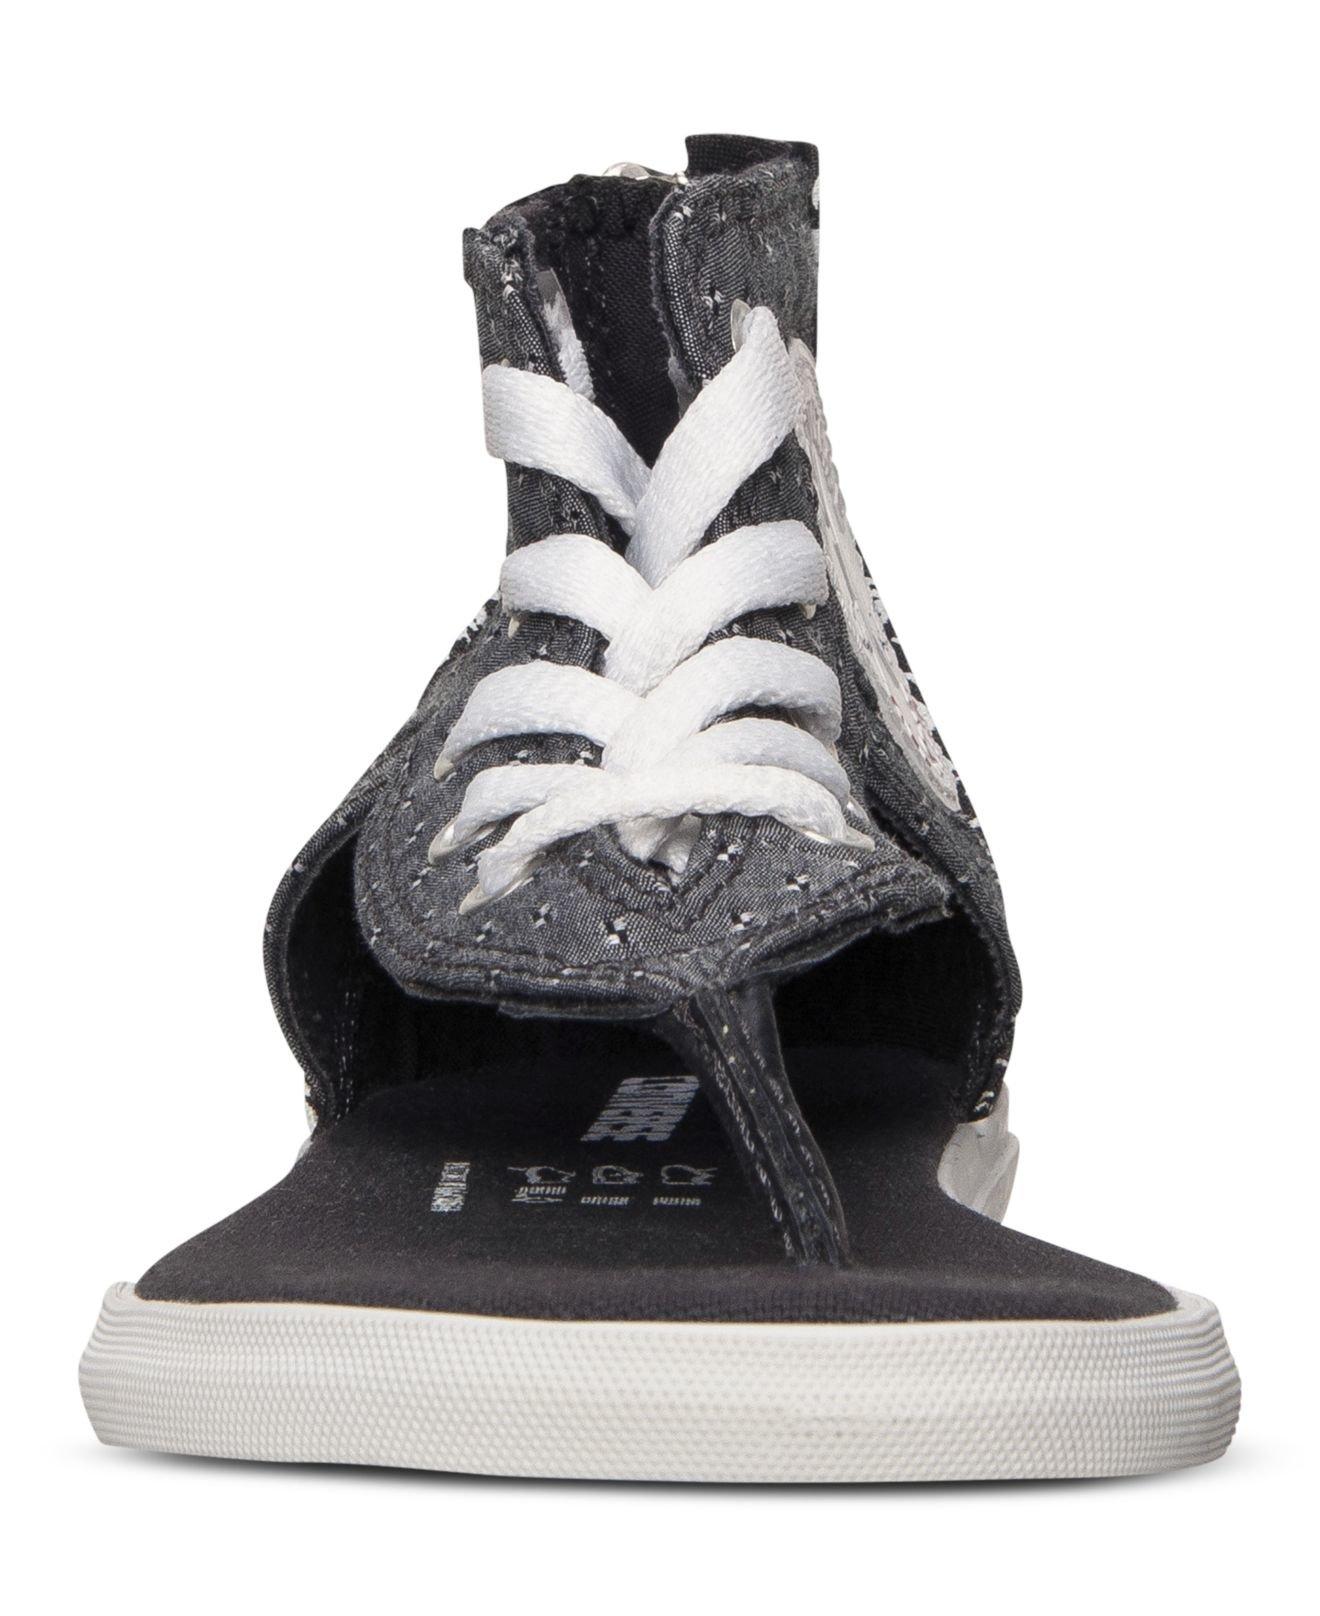 fe4e75f944c Converse Converse Converse Sandals Sandals Sandals Sandals Gladiator Taylor  From Chuck Thong Lyst Women s fan1dcqwPP